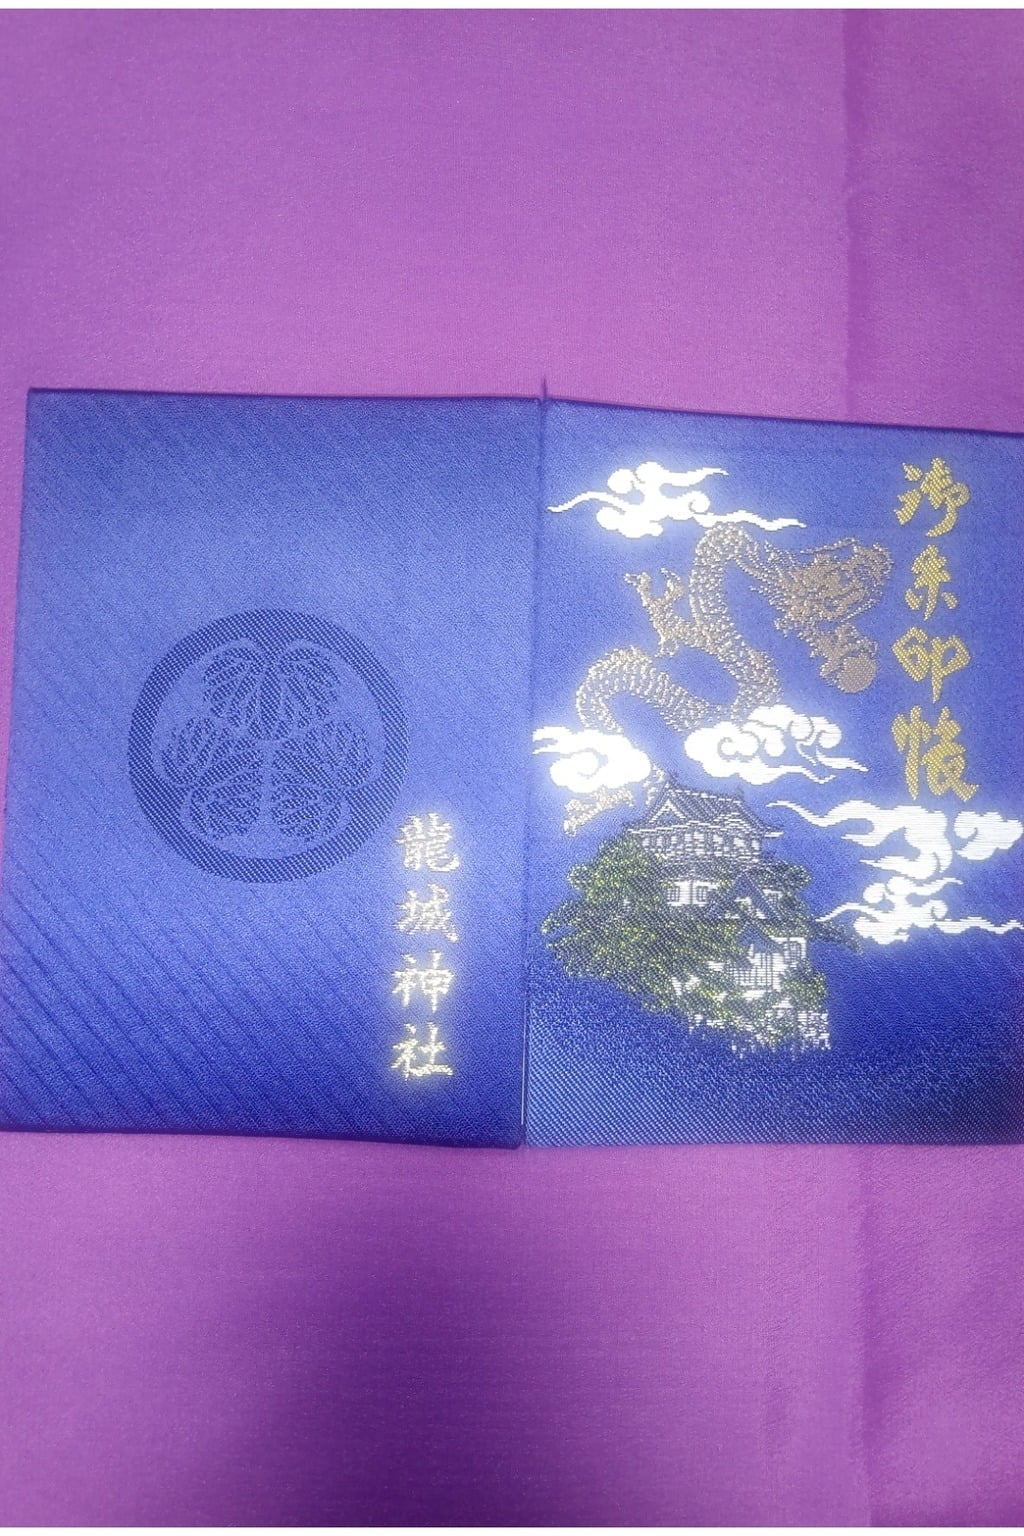 龍城神社の御朱印帳